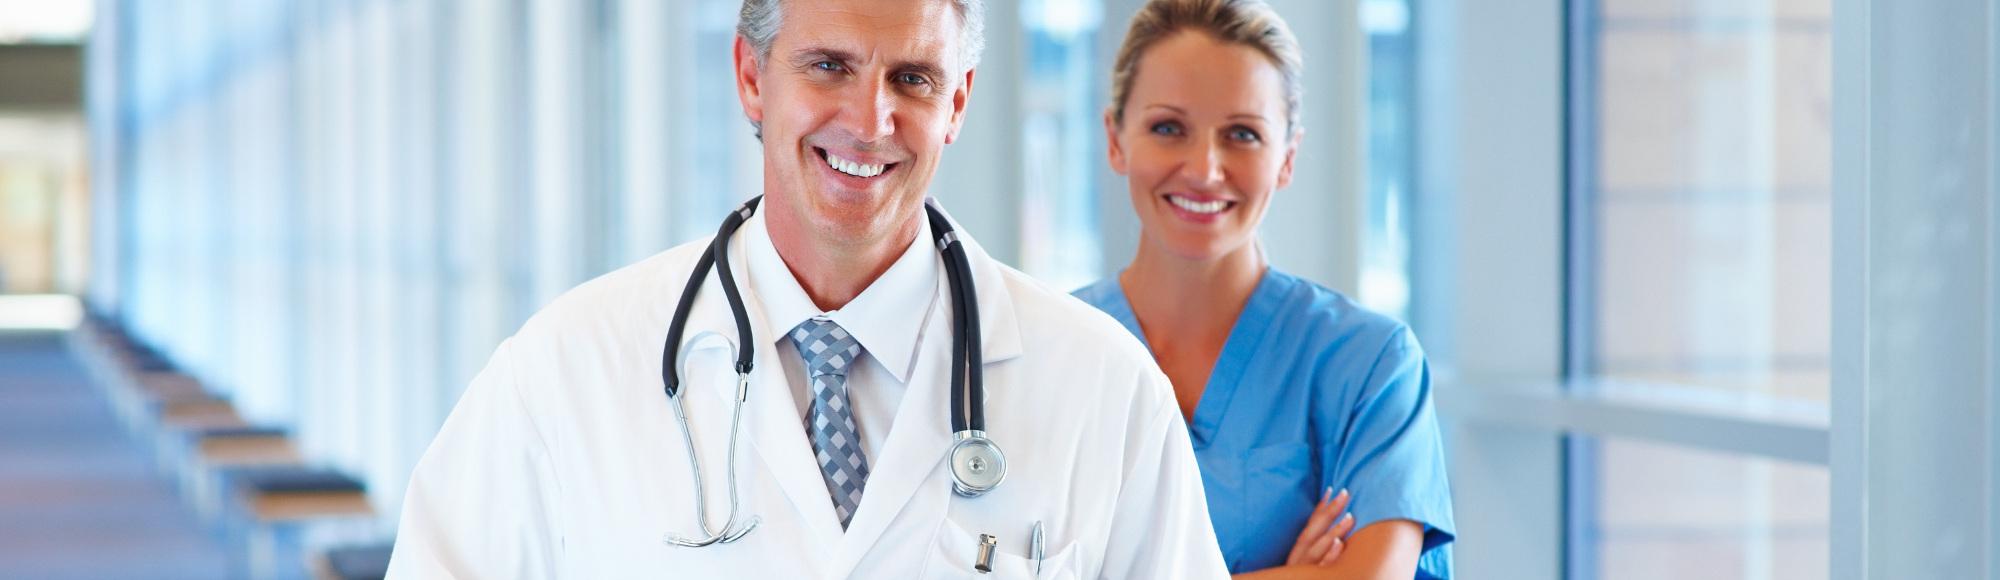 medico-dipendente-ospedaliero